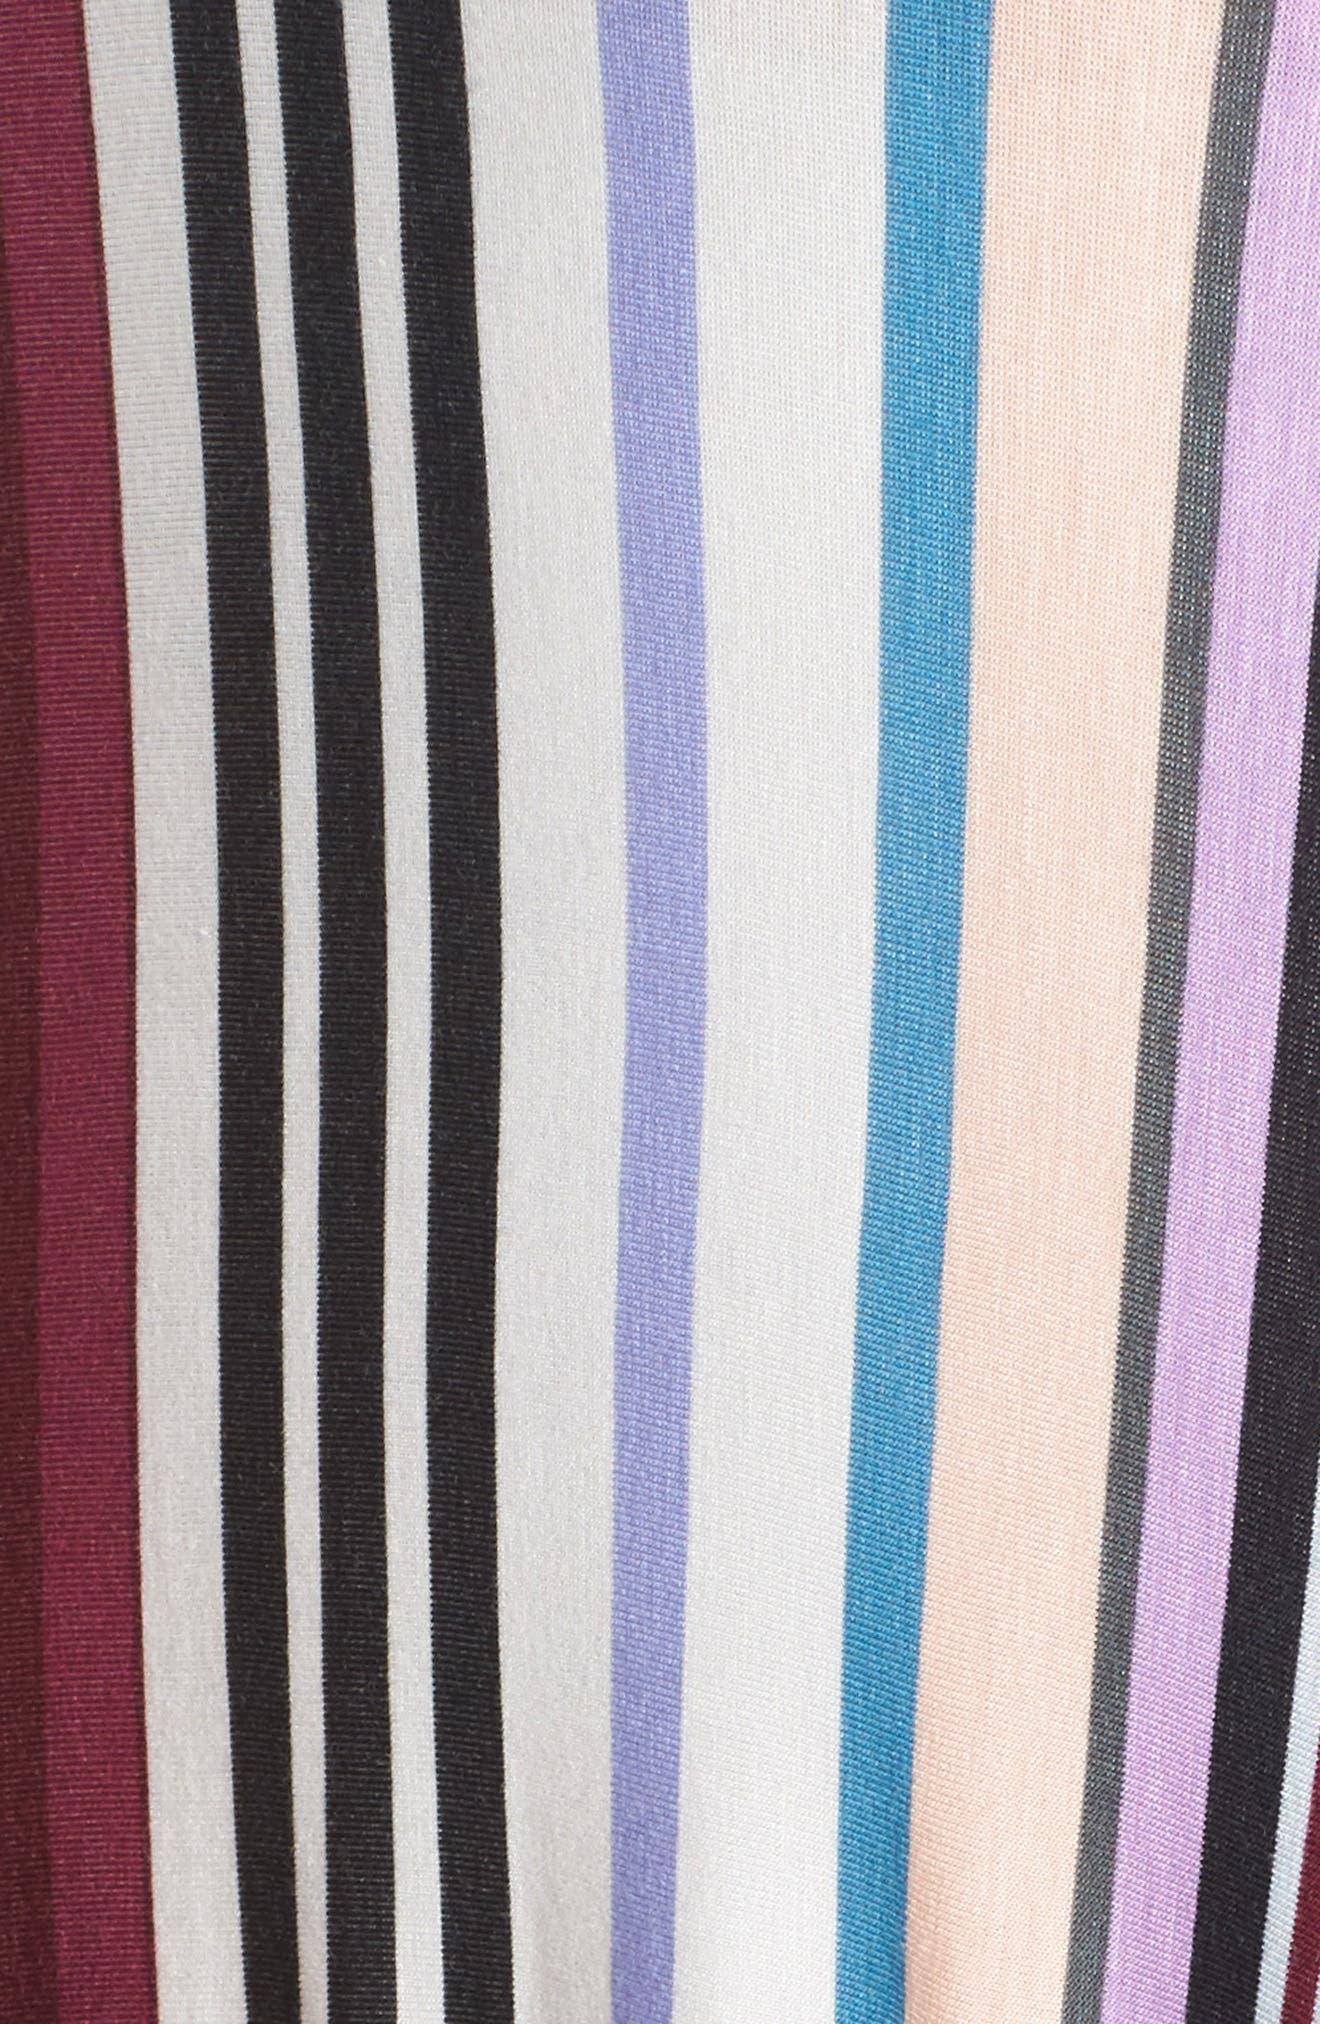 Clemette Strapless Maxi Dress,                             Alternate thumbnail 6, color,                             Purple Multi Stripe